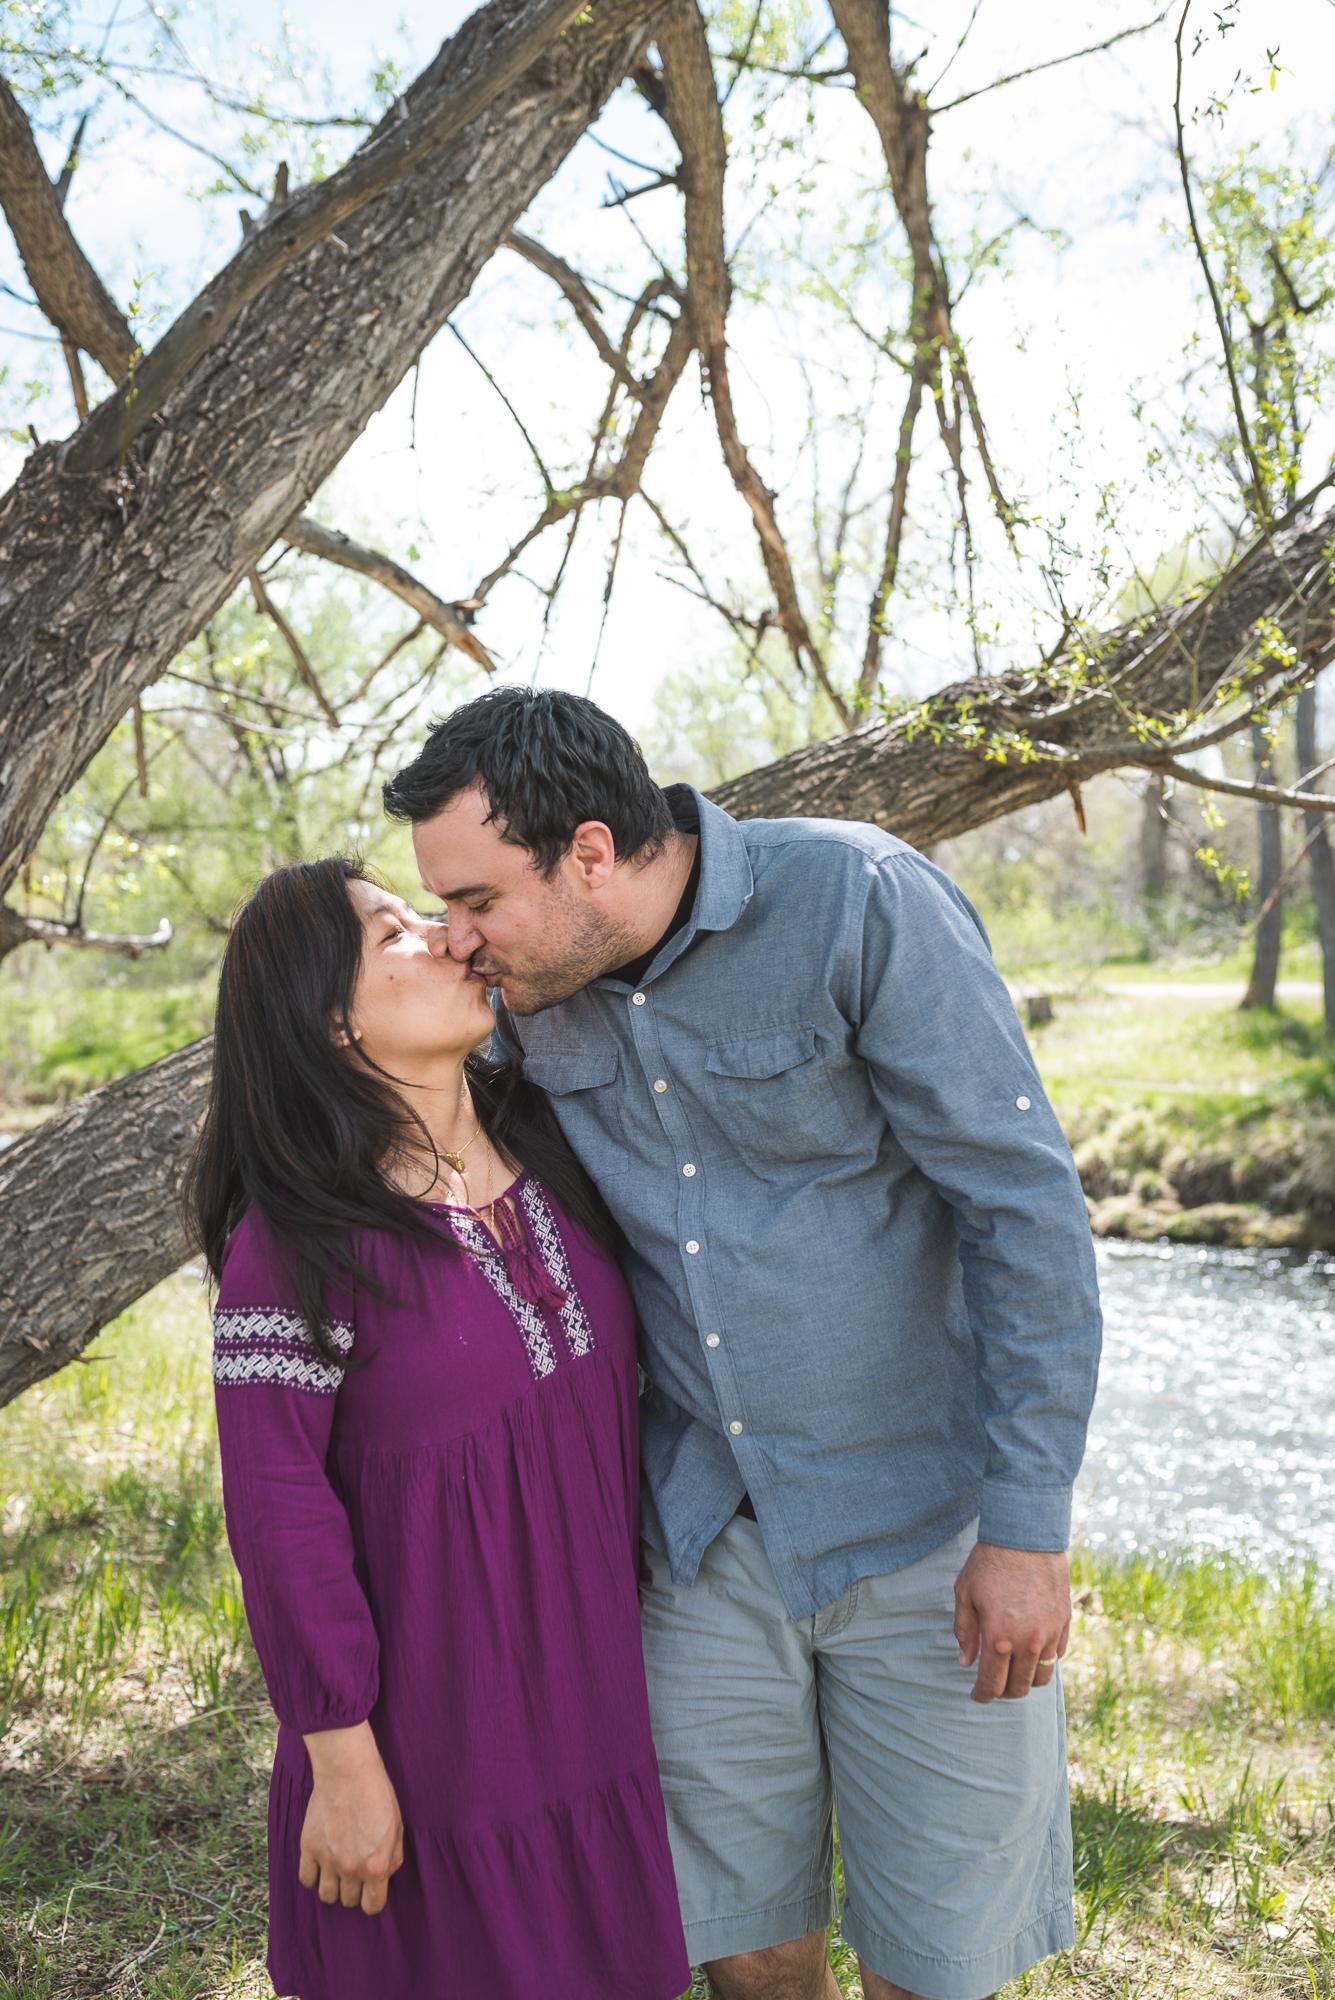 Denver+Boulder+Lifestyle+Family+Photographer+MiniSessions+JennyFolmanPhotography-14.jpg